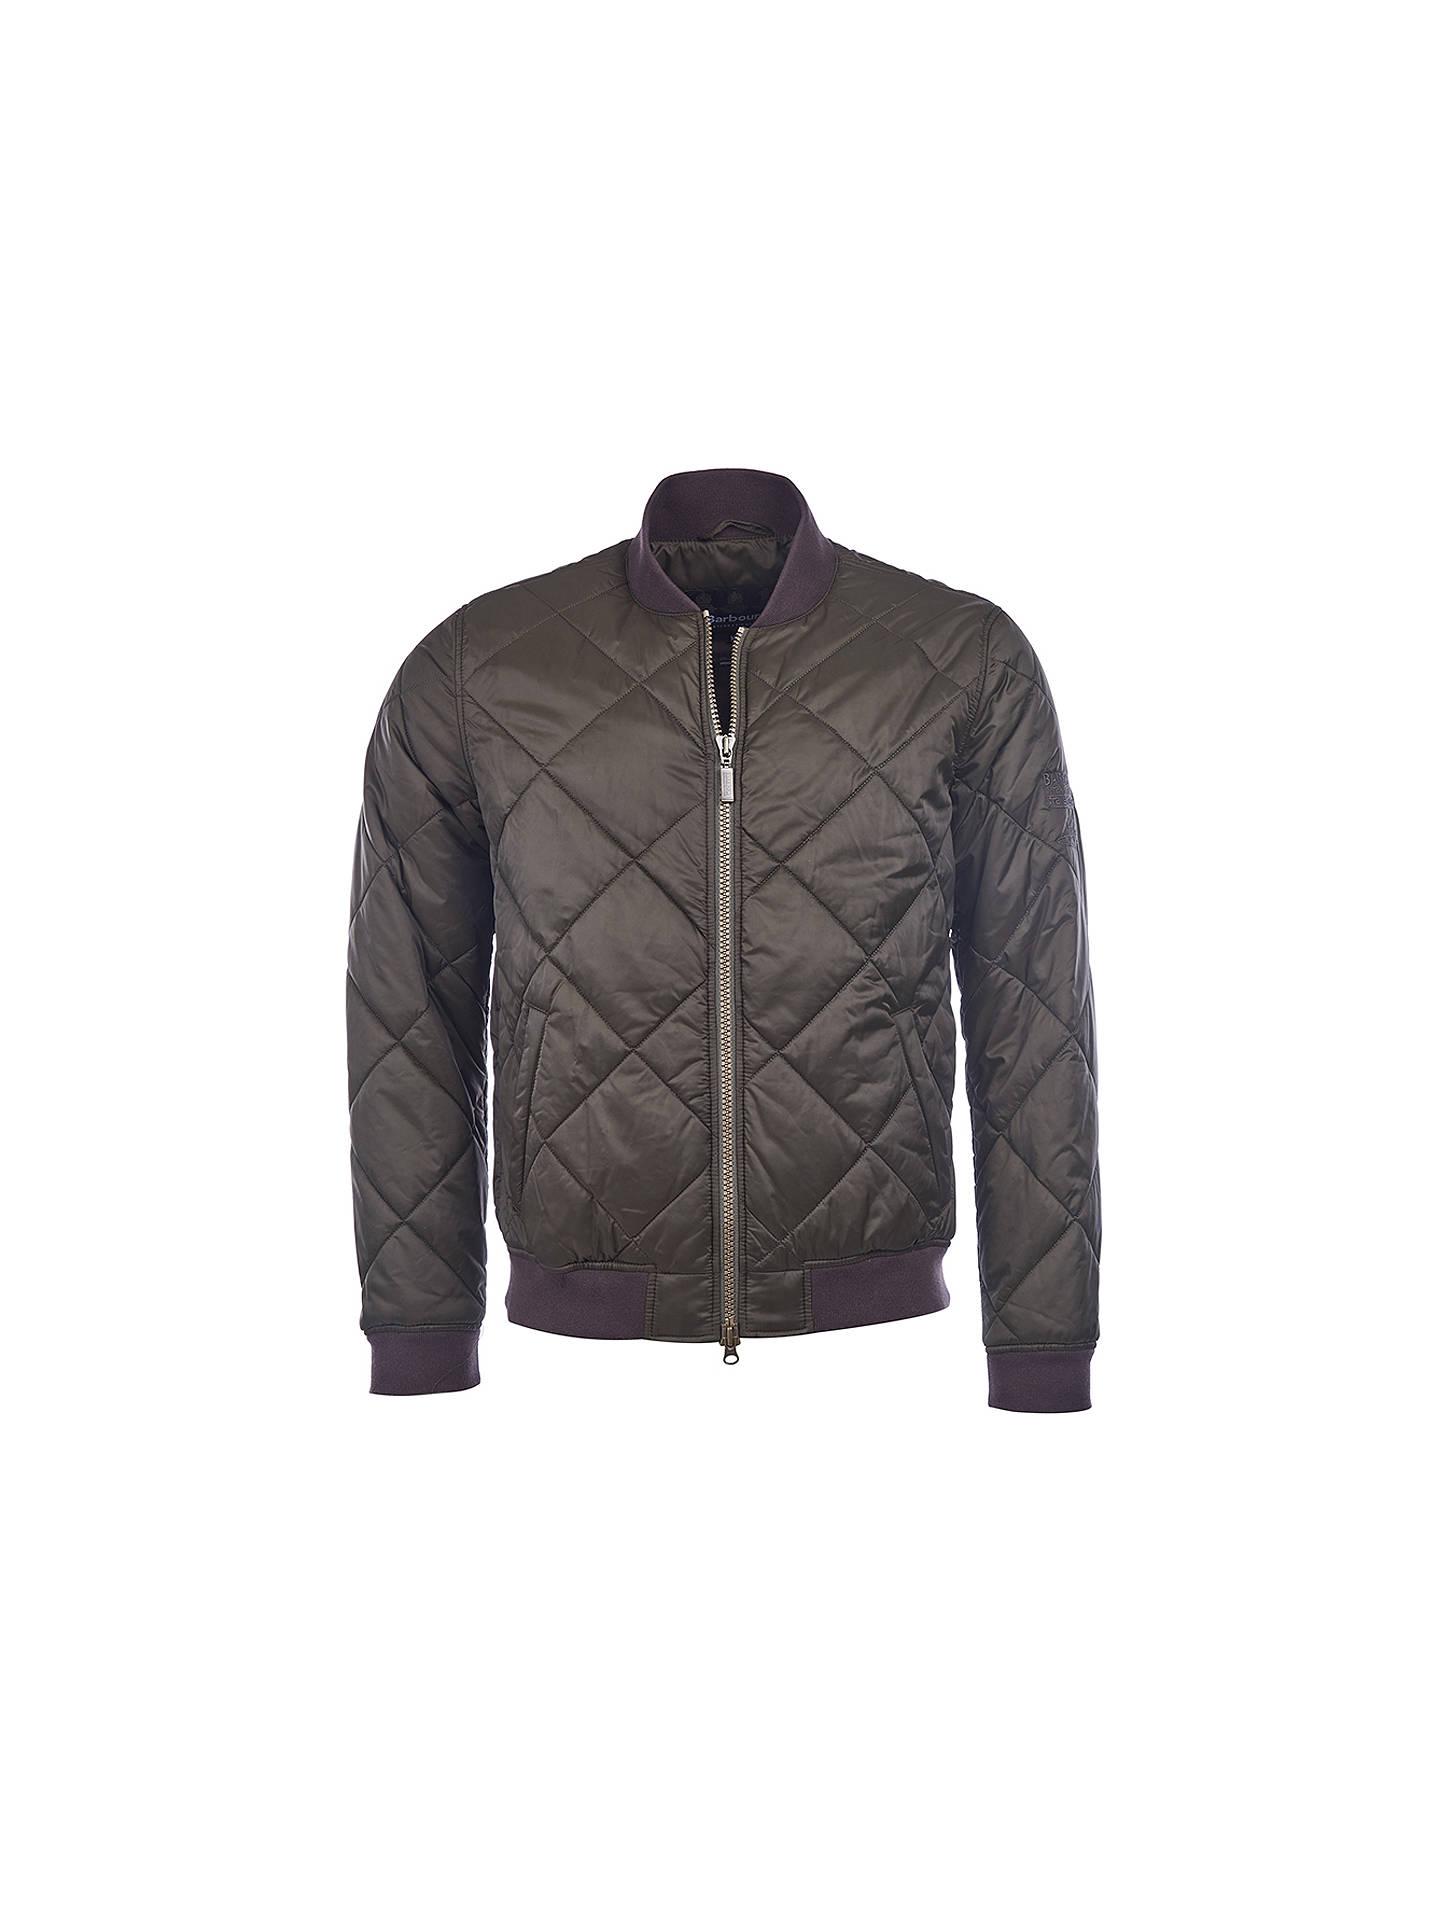 Barbour International Steve Mcqueen Bomber Quilted Jacket